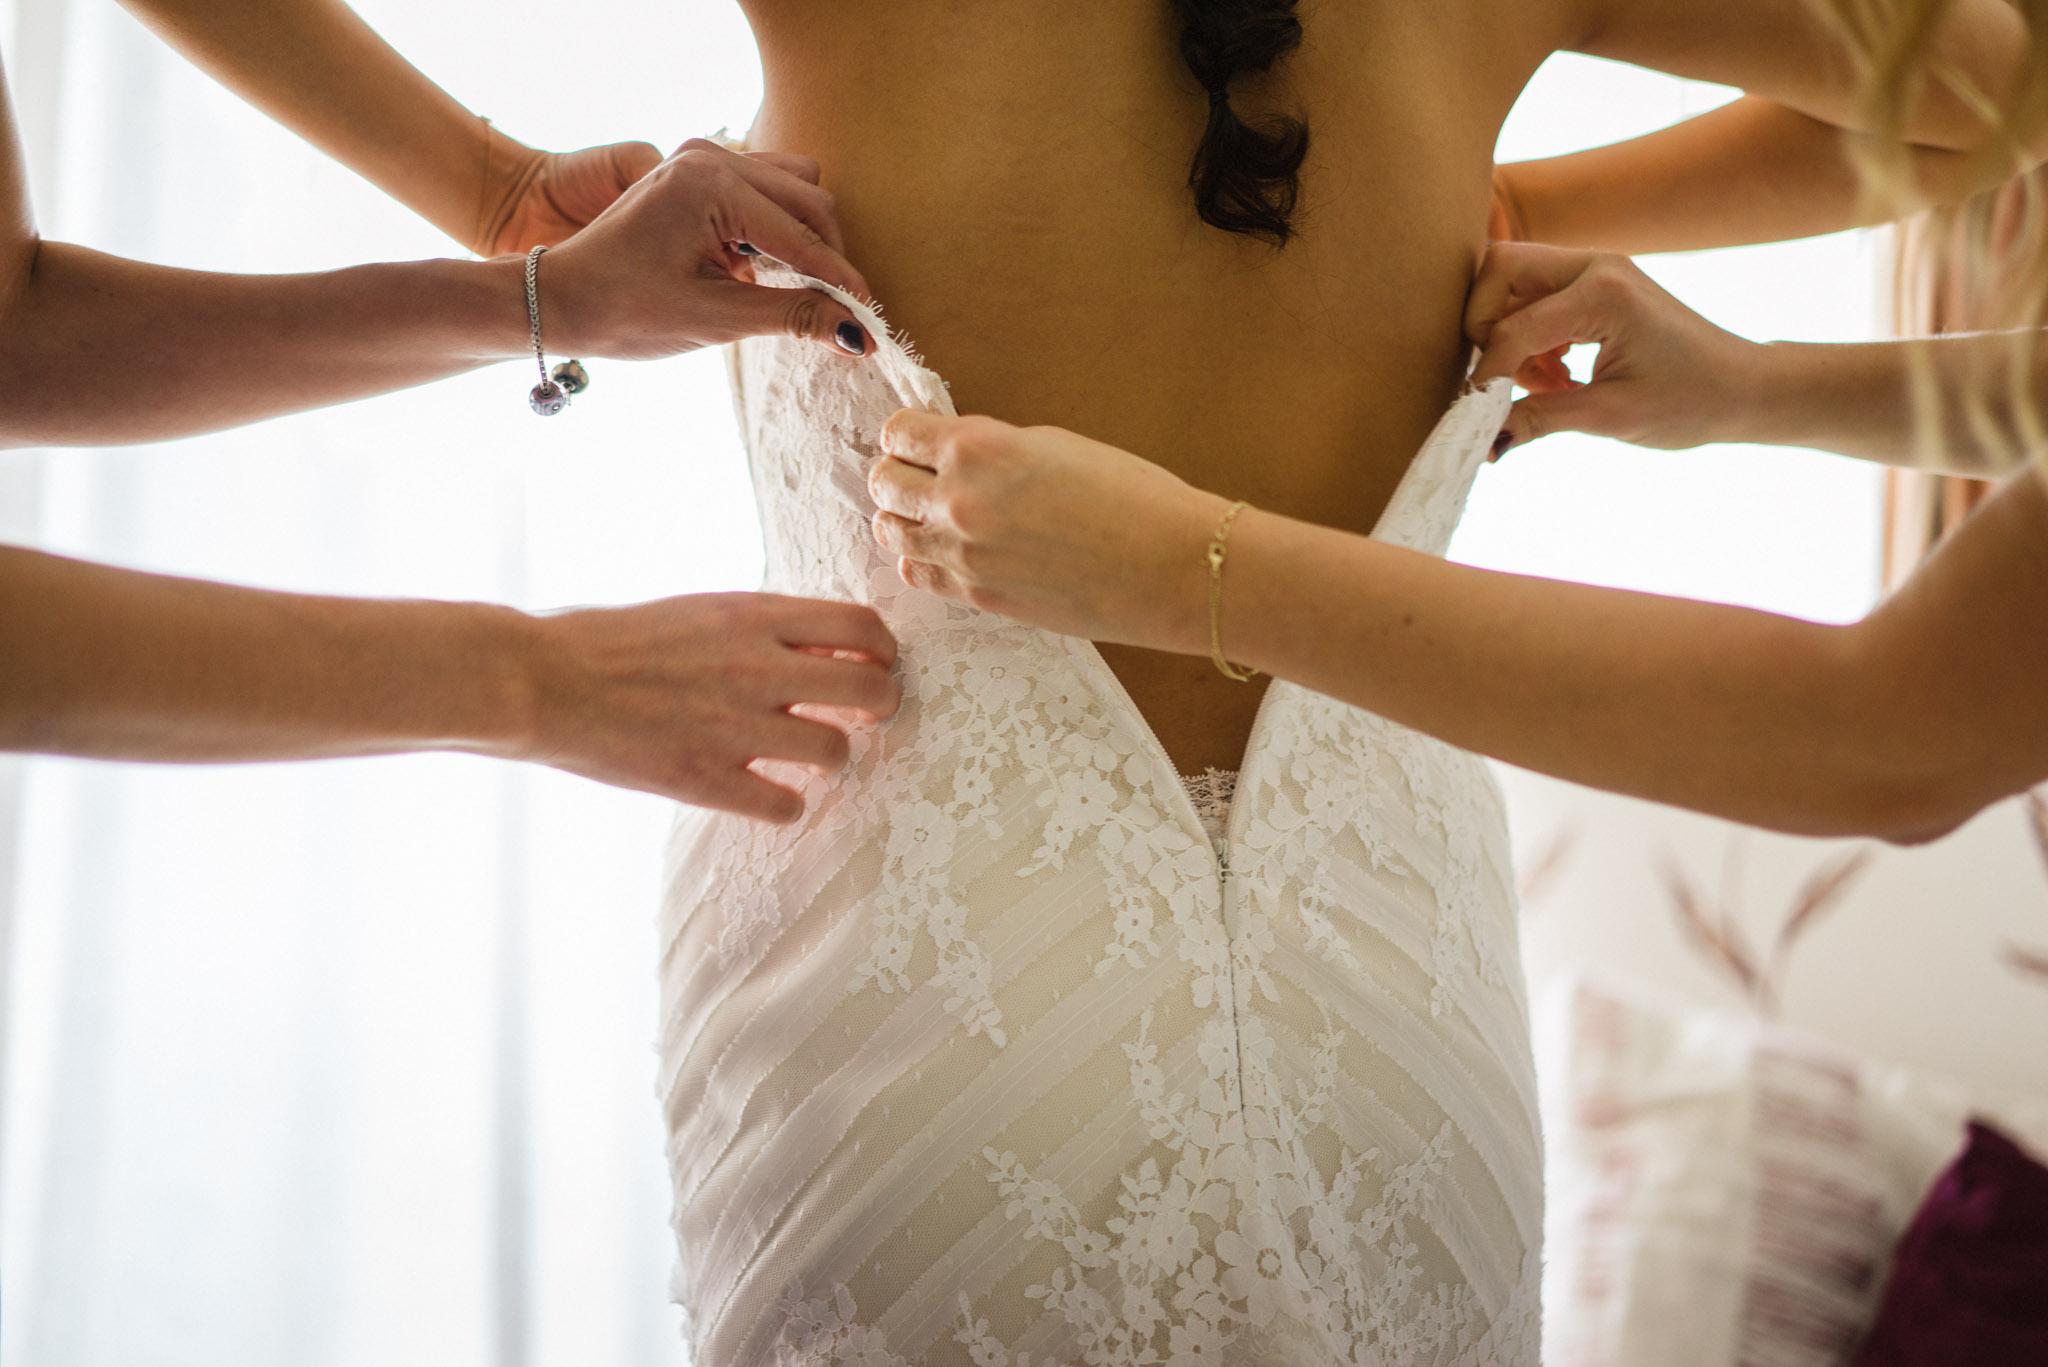 ©www.mauriziosolisbroca.com-20161001maurizio-solis-broca-mexico-canada-wedding-photographer20161001DSC04633-Edit.jpg